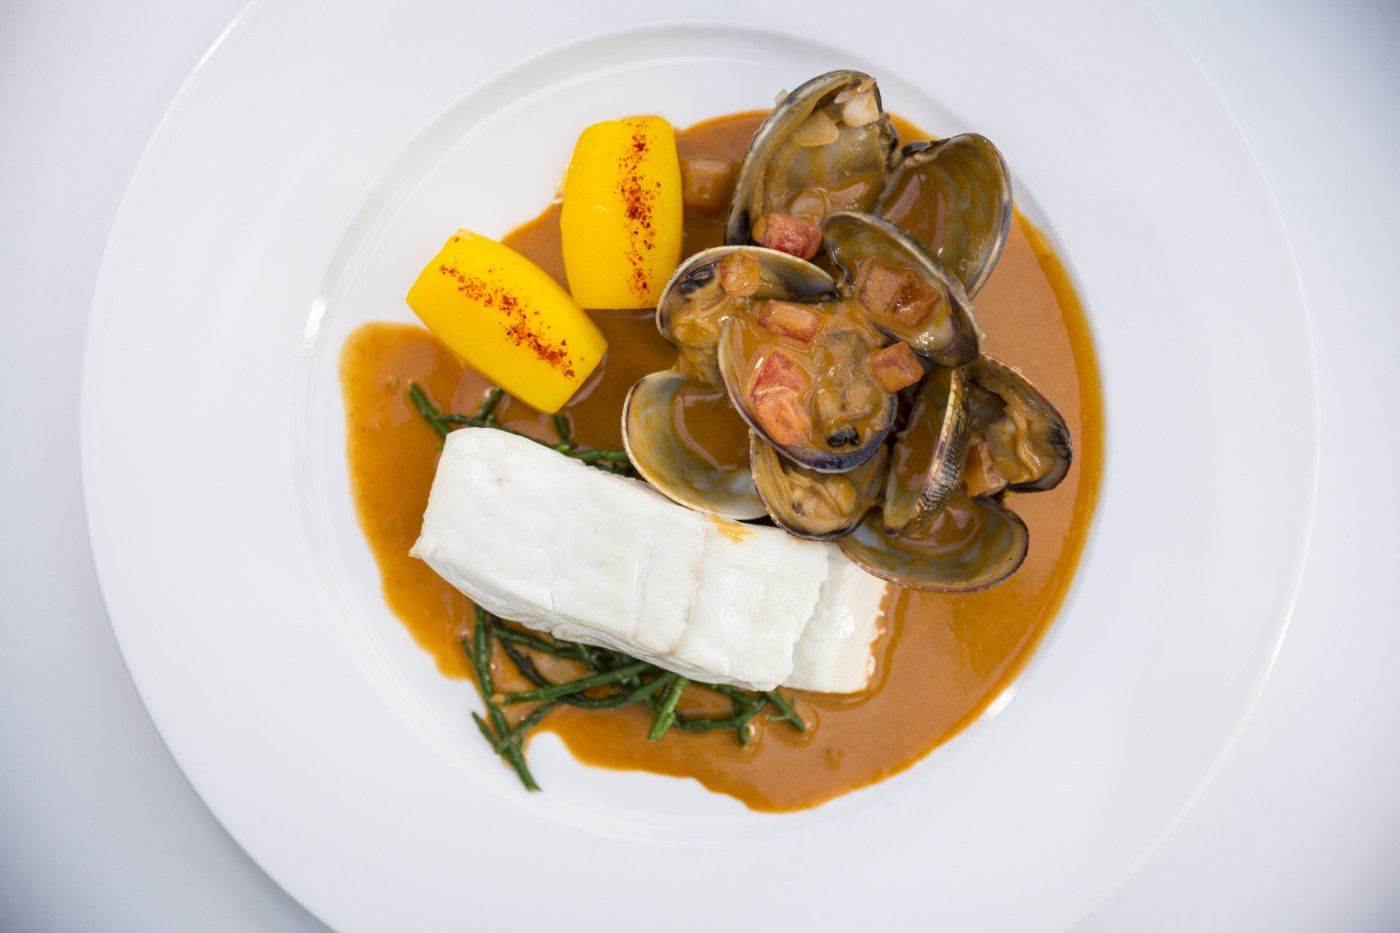 Poached halibut lobster bisque samphire dorset clams saffron poached halibut lobster bisque samphire dorset clams saffron potato malvernweather Choice Image